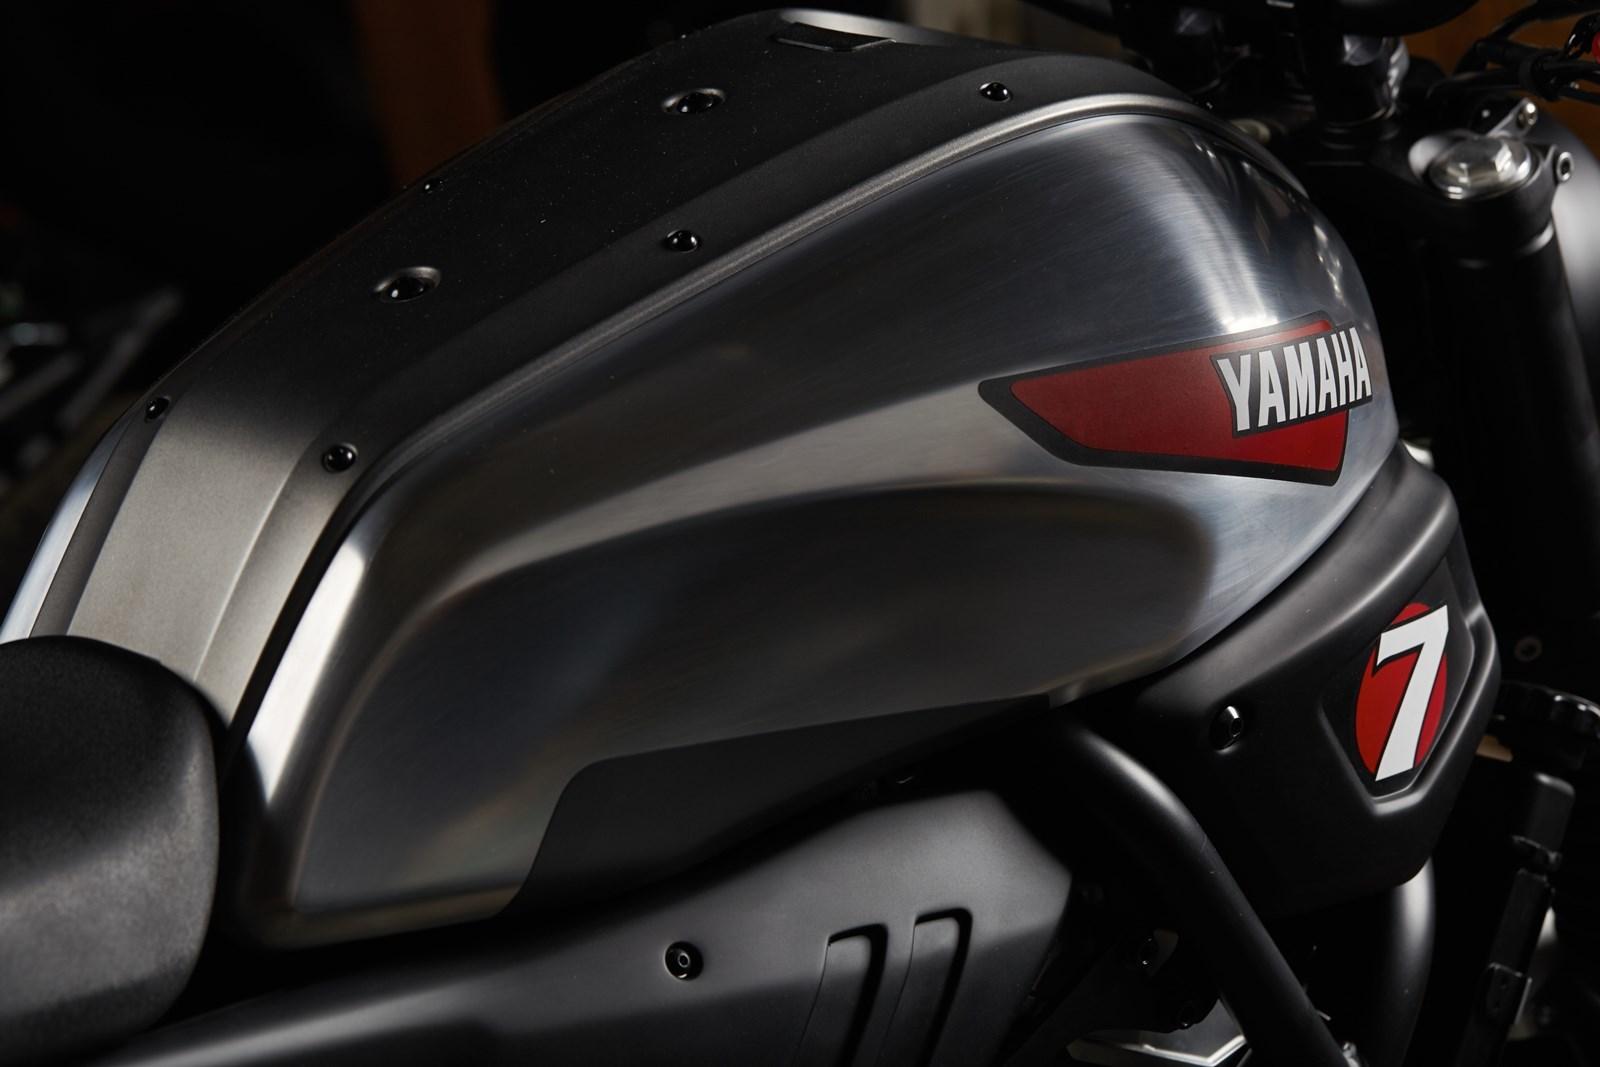 Foto de Yamaha XSR700 Super 7 by JvB-Moto (18/25)